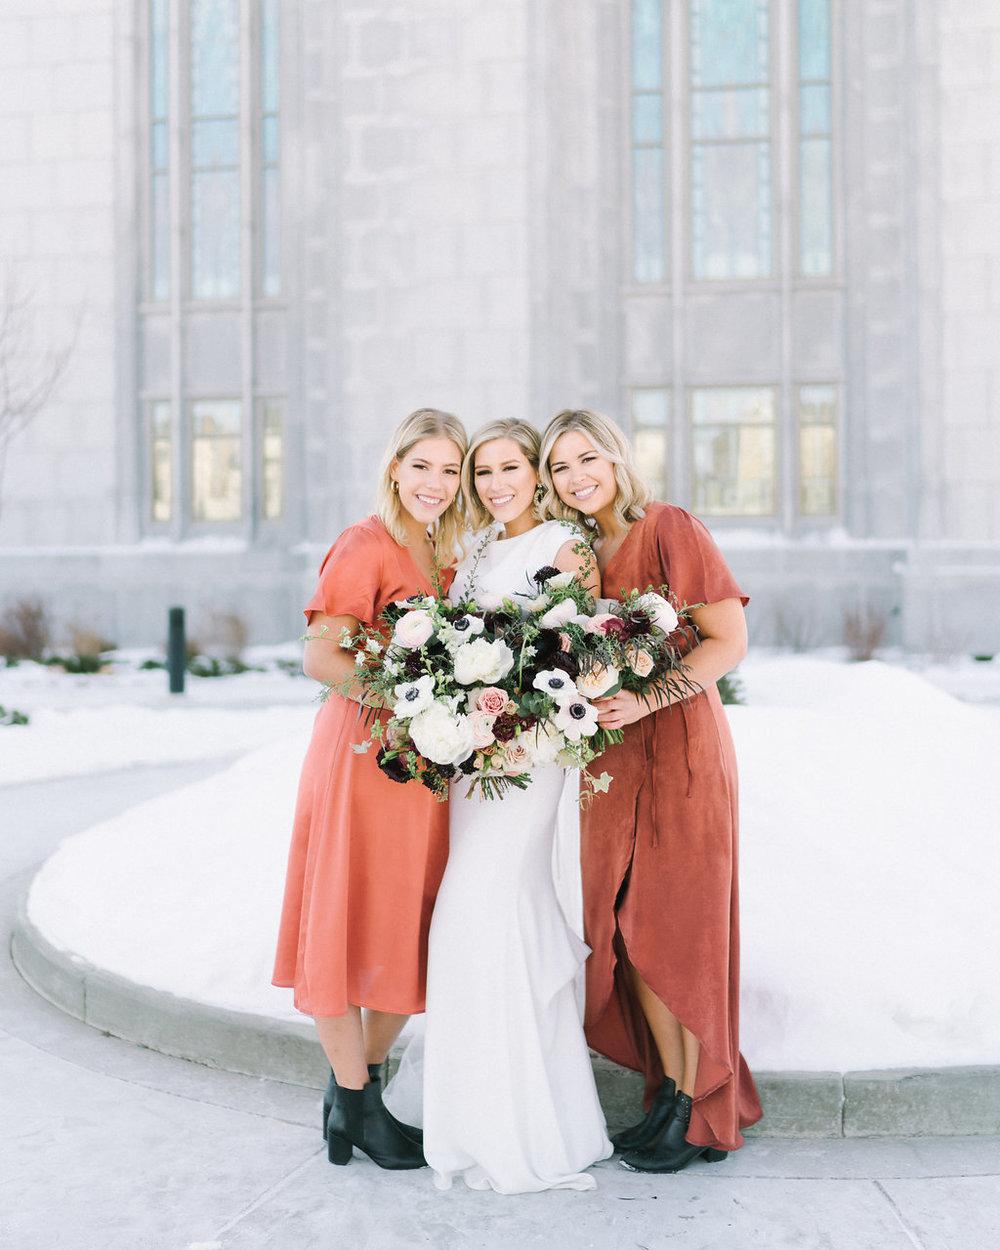 Emily Michelson - Calgary Wedding Photograpers